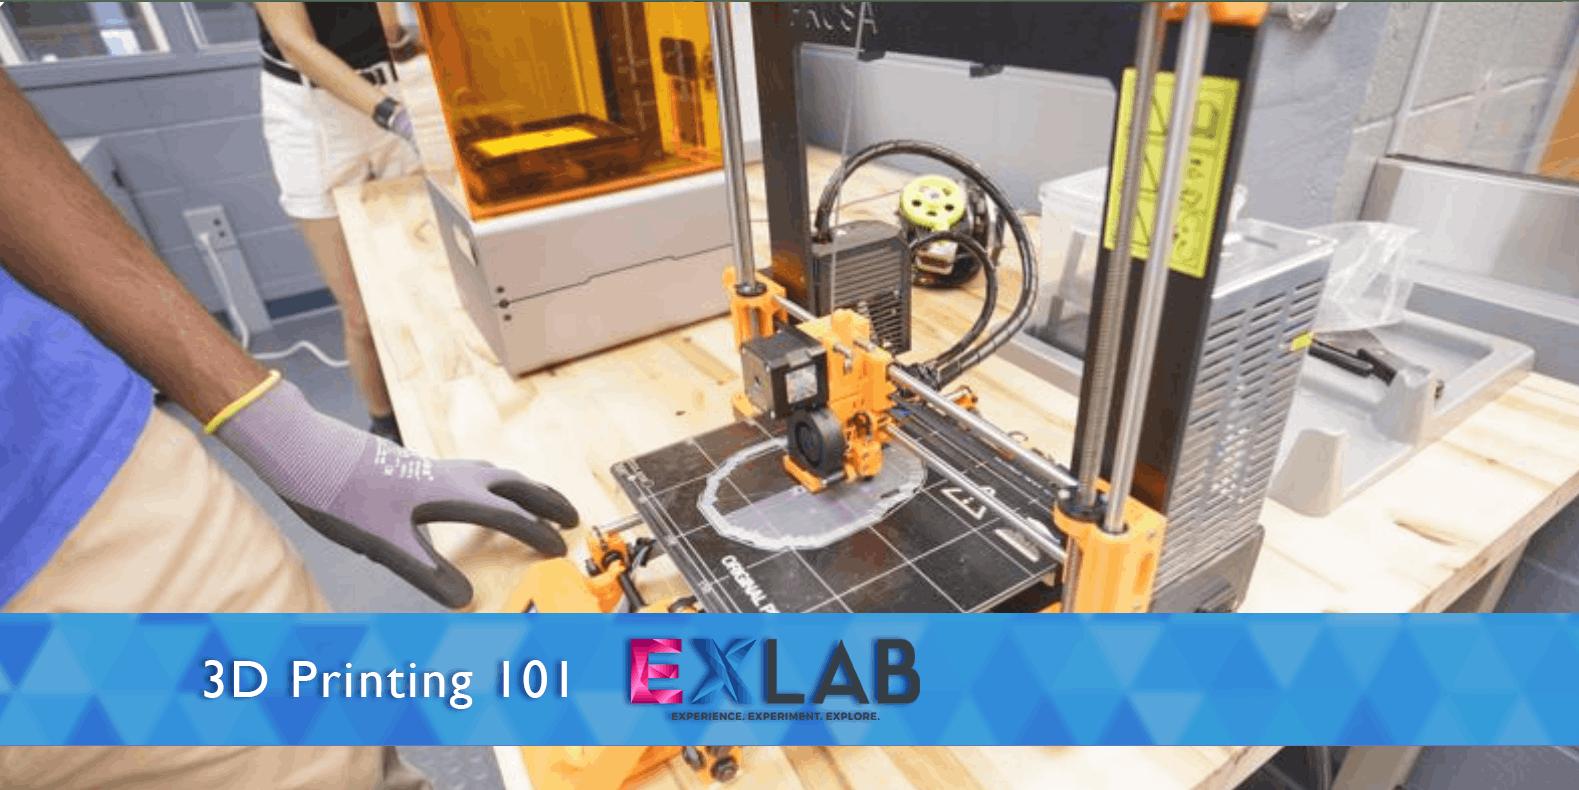 3D Printing 101 - EXLAB  - Atlanta